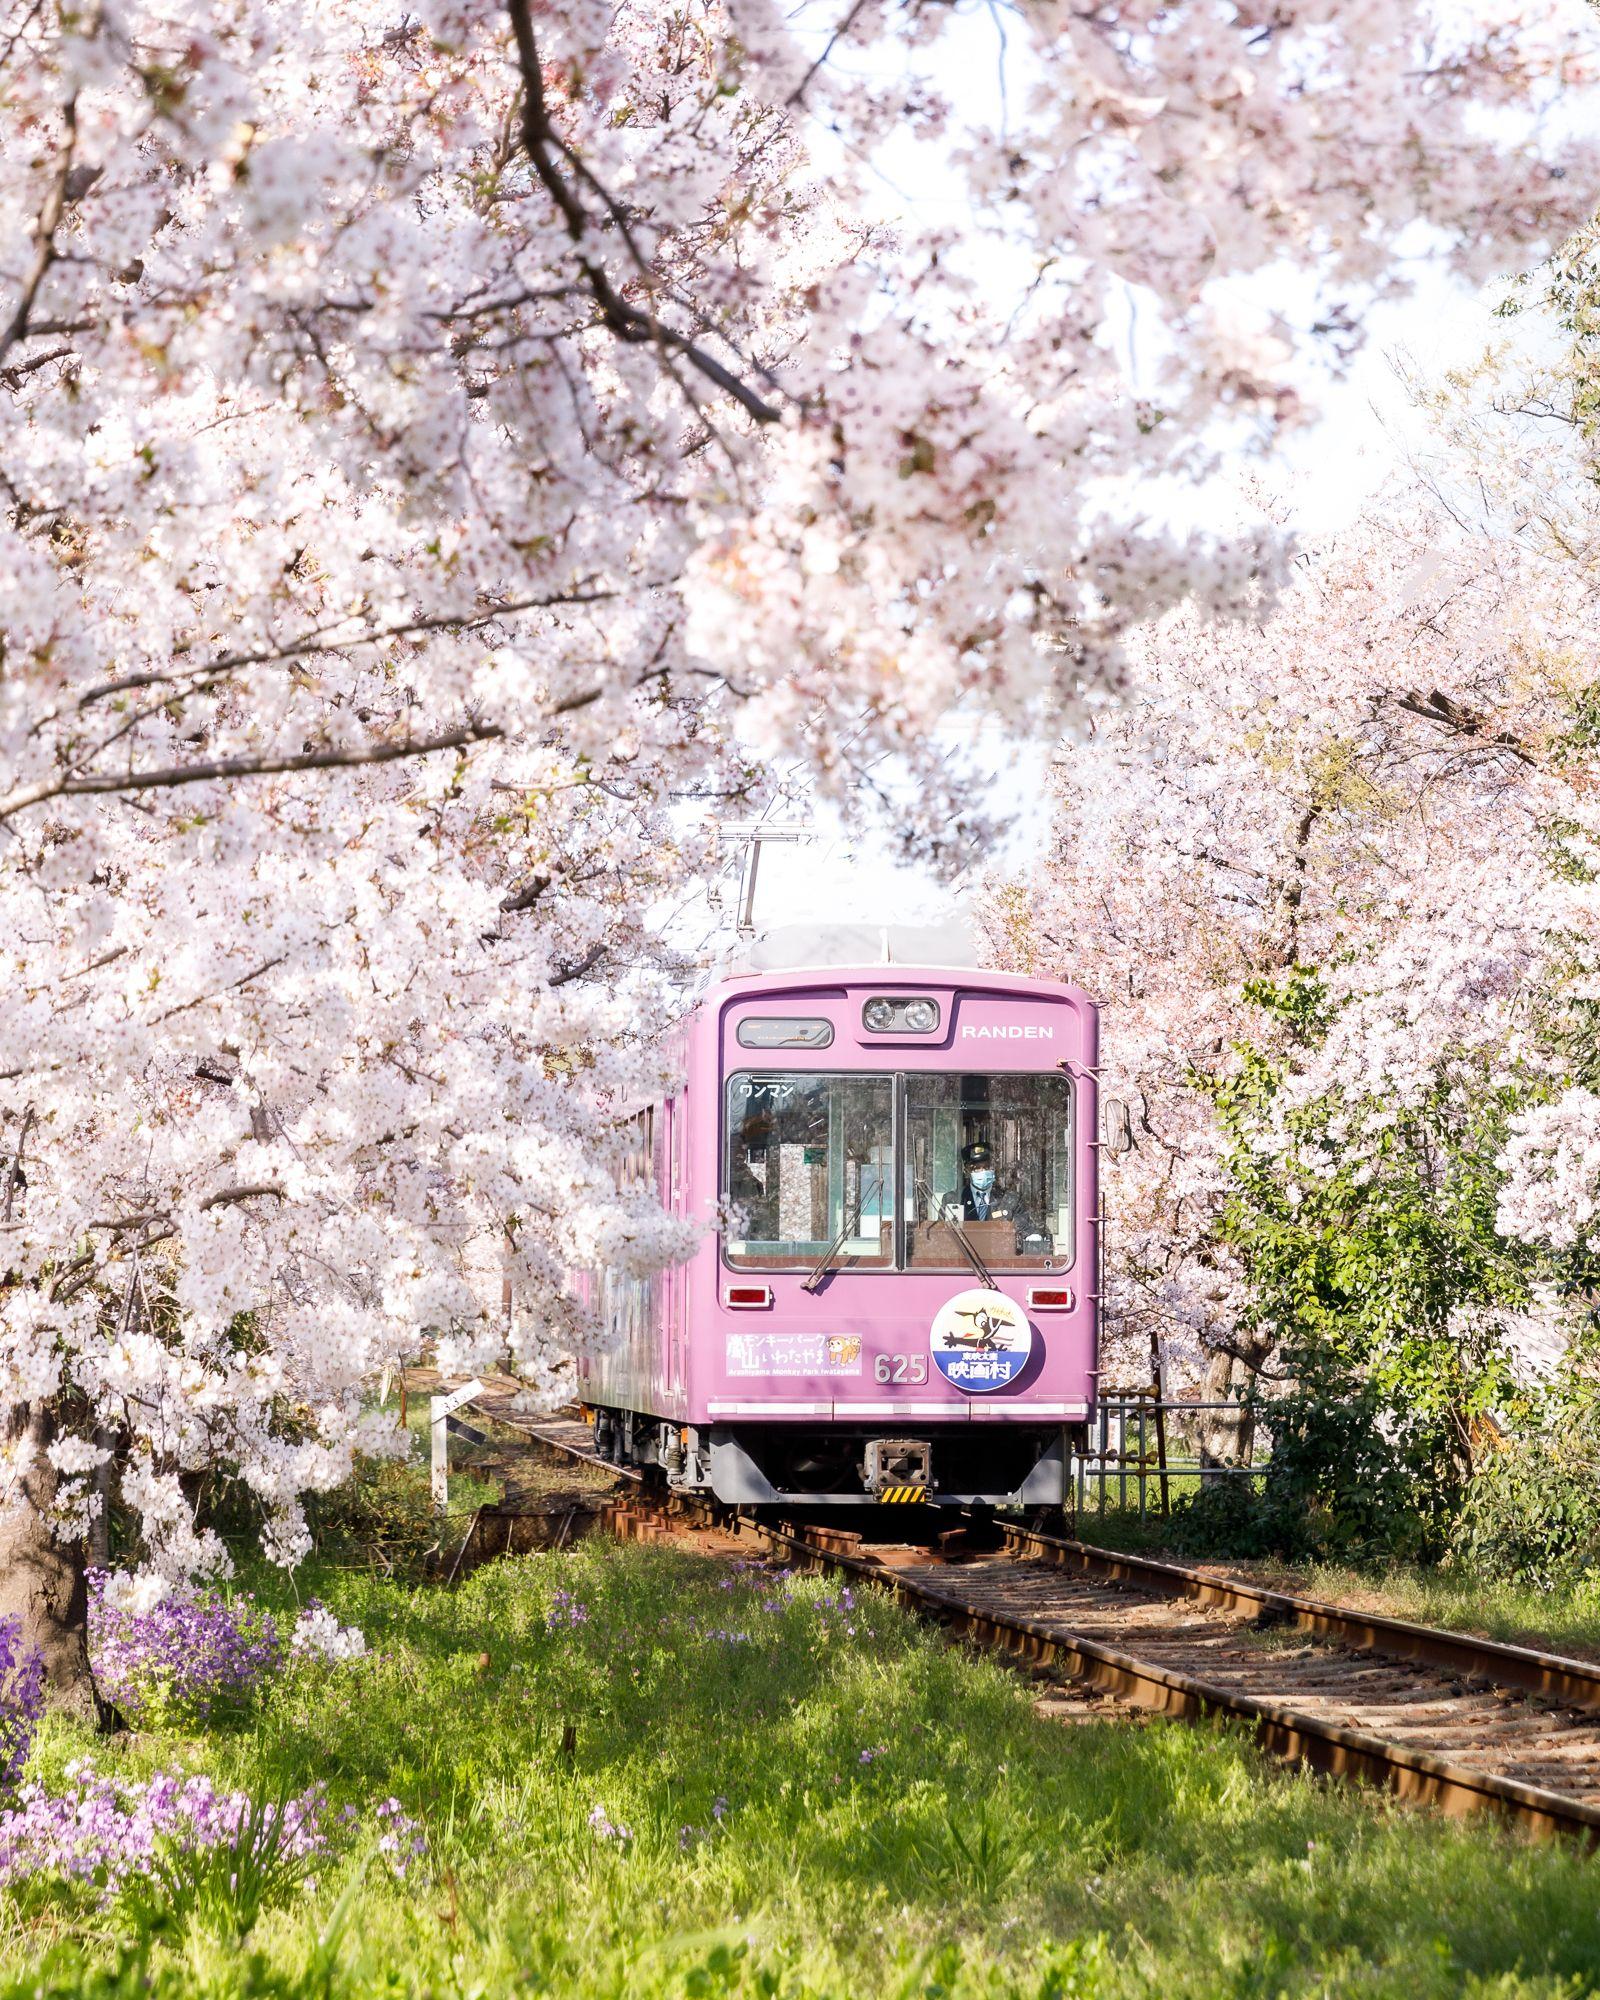 Top Sakura Photo In Japan The Sakura Train In Kyoto During Cherry Blossom Cherry Blossom Japan Japan Sakura Cherry Blossom